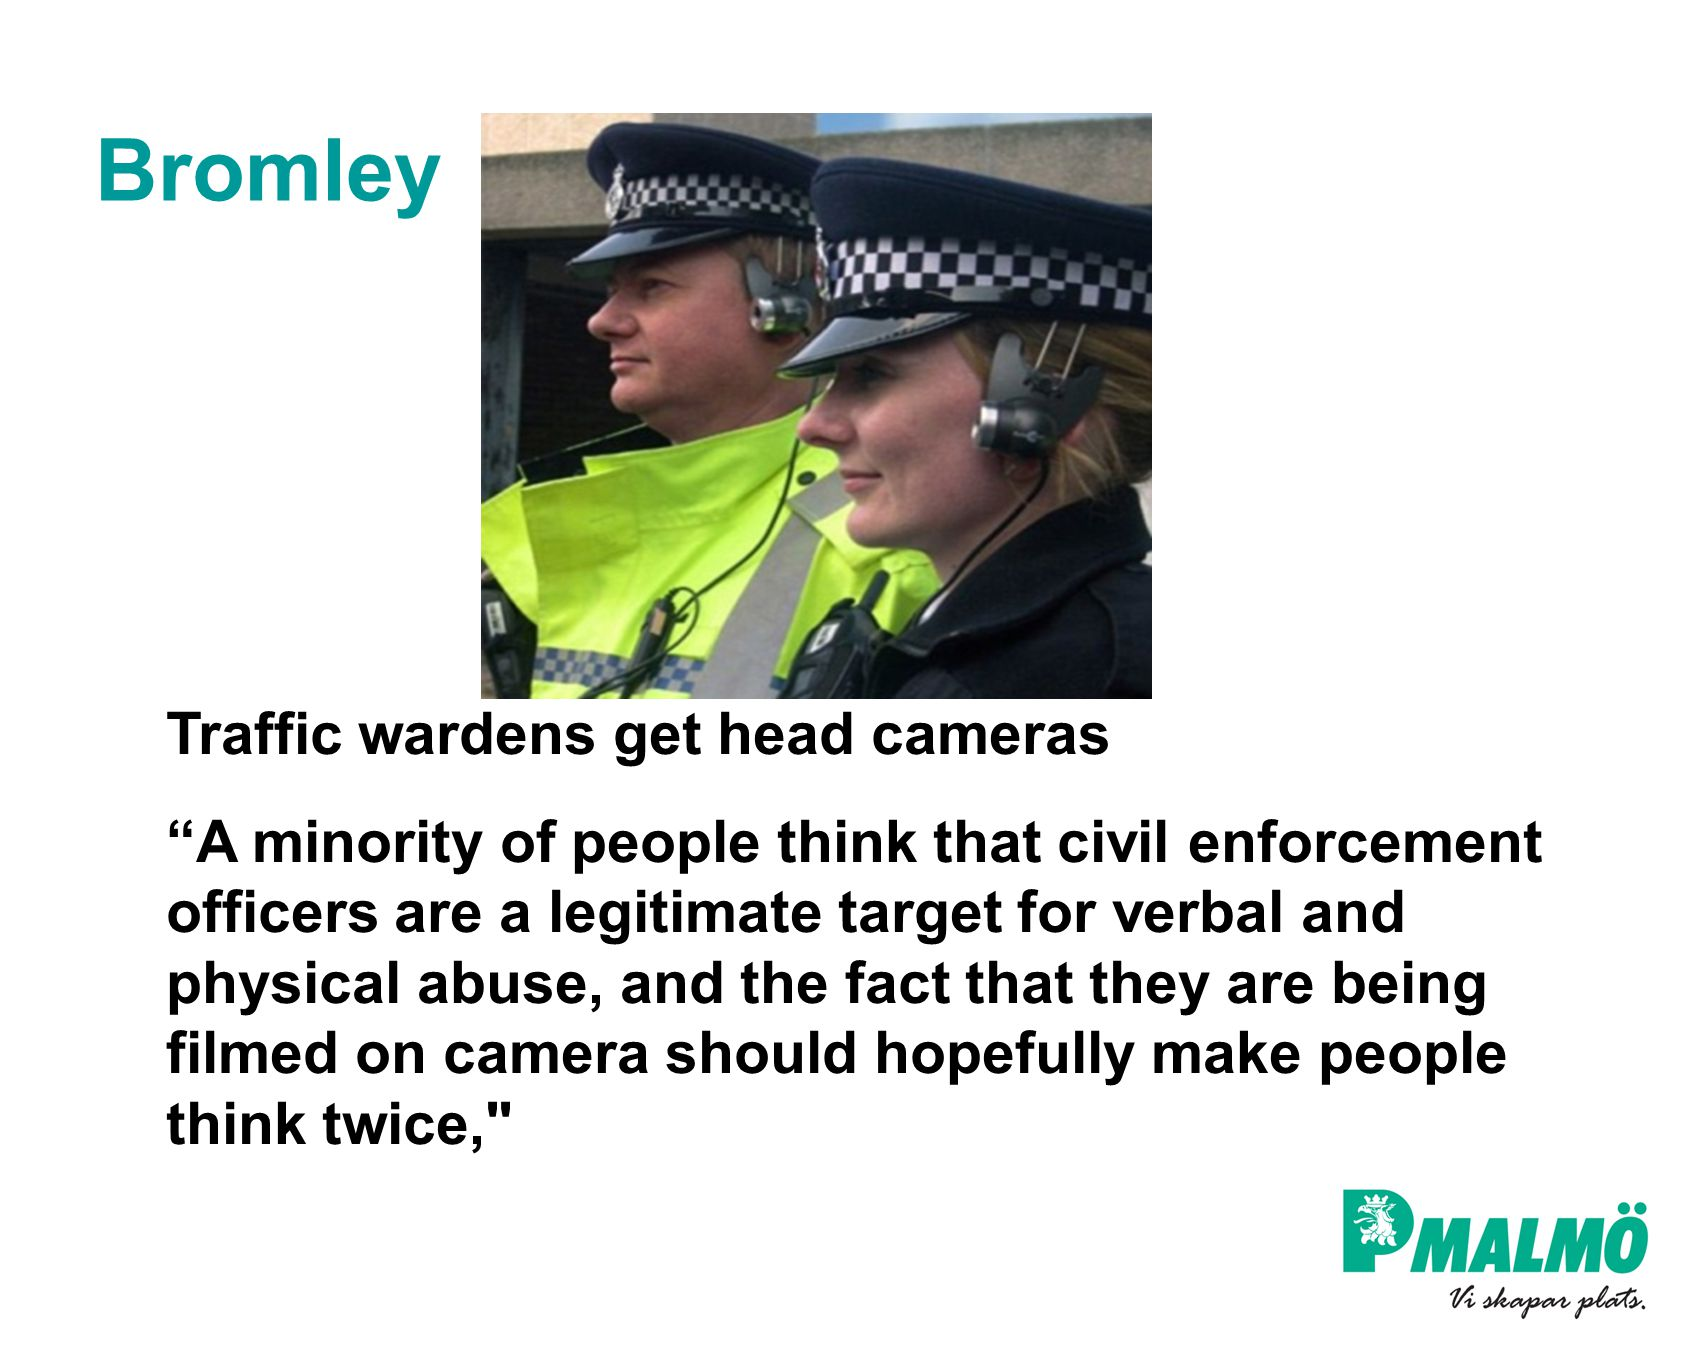 Bromley Traffic wardens get head cameras